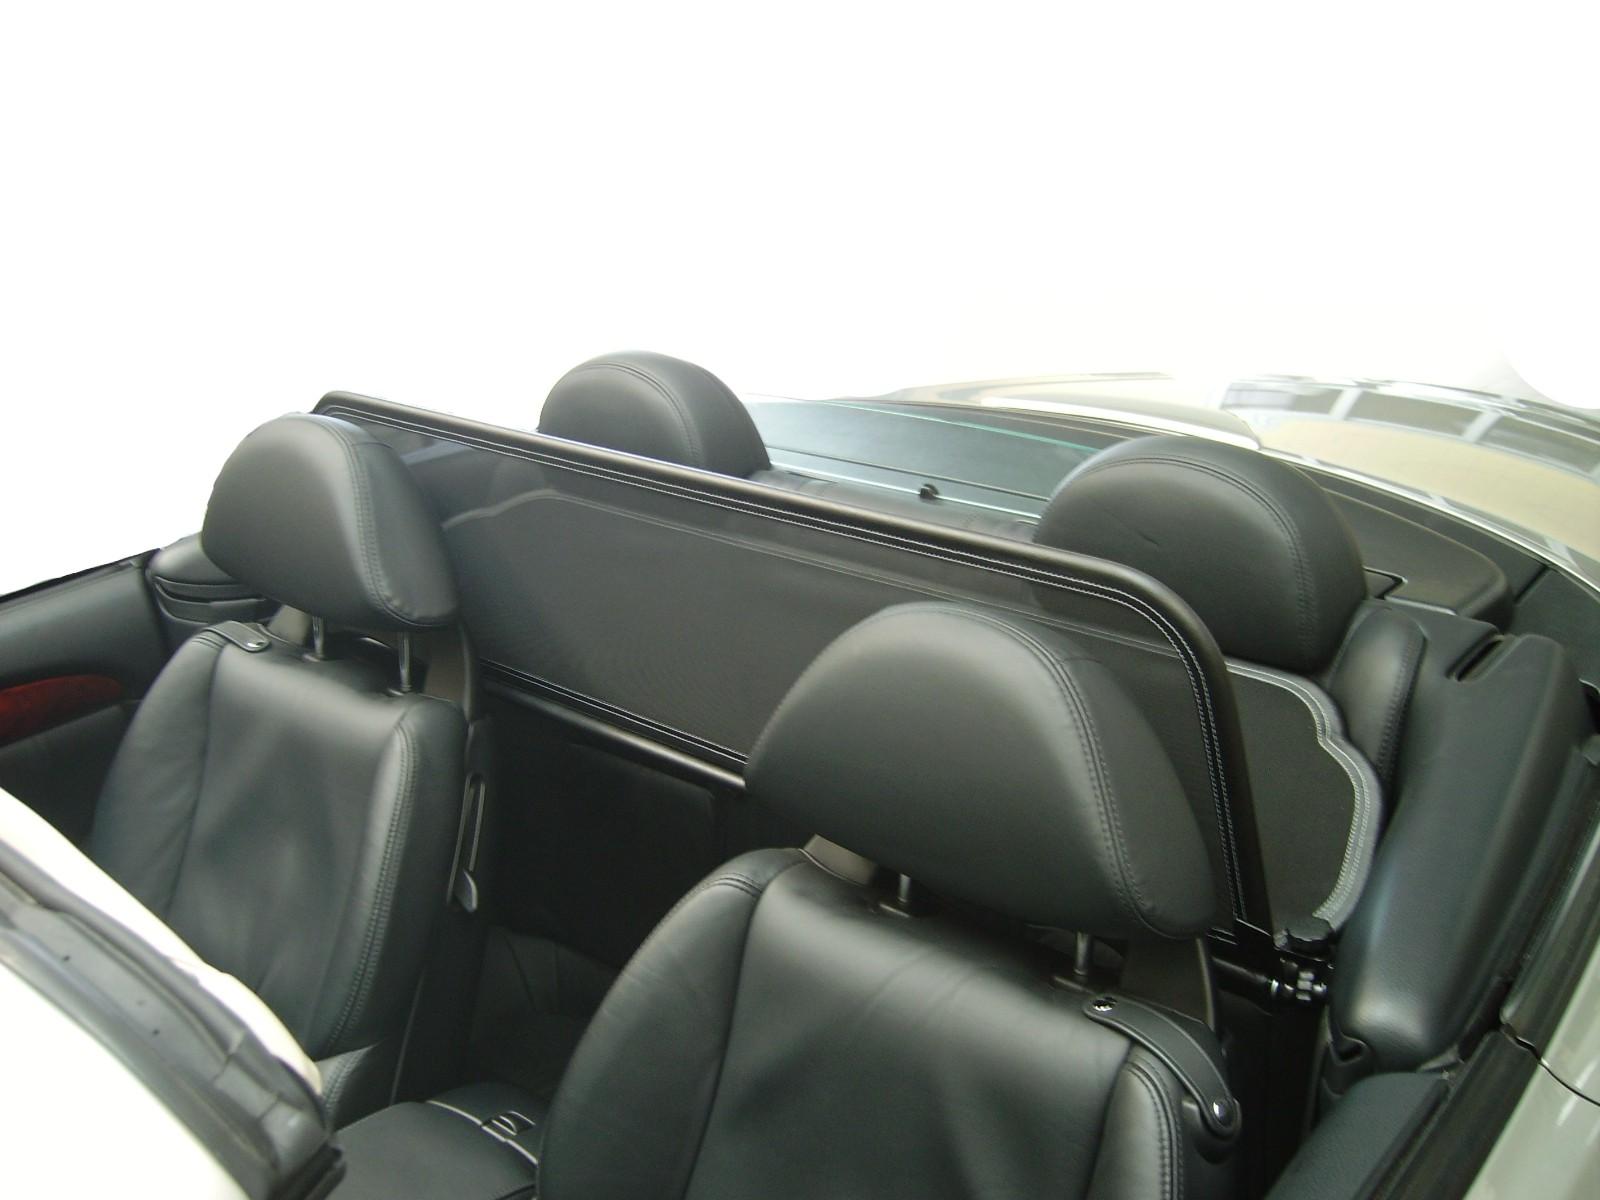 Lexus Sc 430 Built 2001-2010 Wind Deflector Wind Deflector Windscreen Windstop